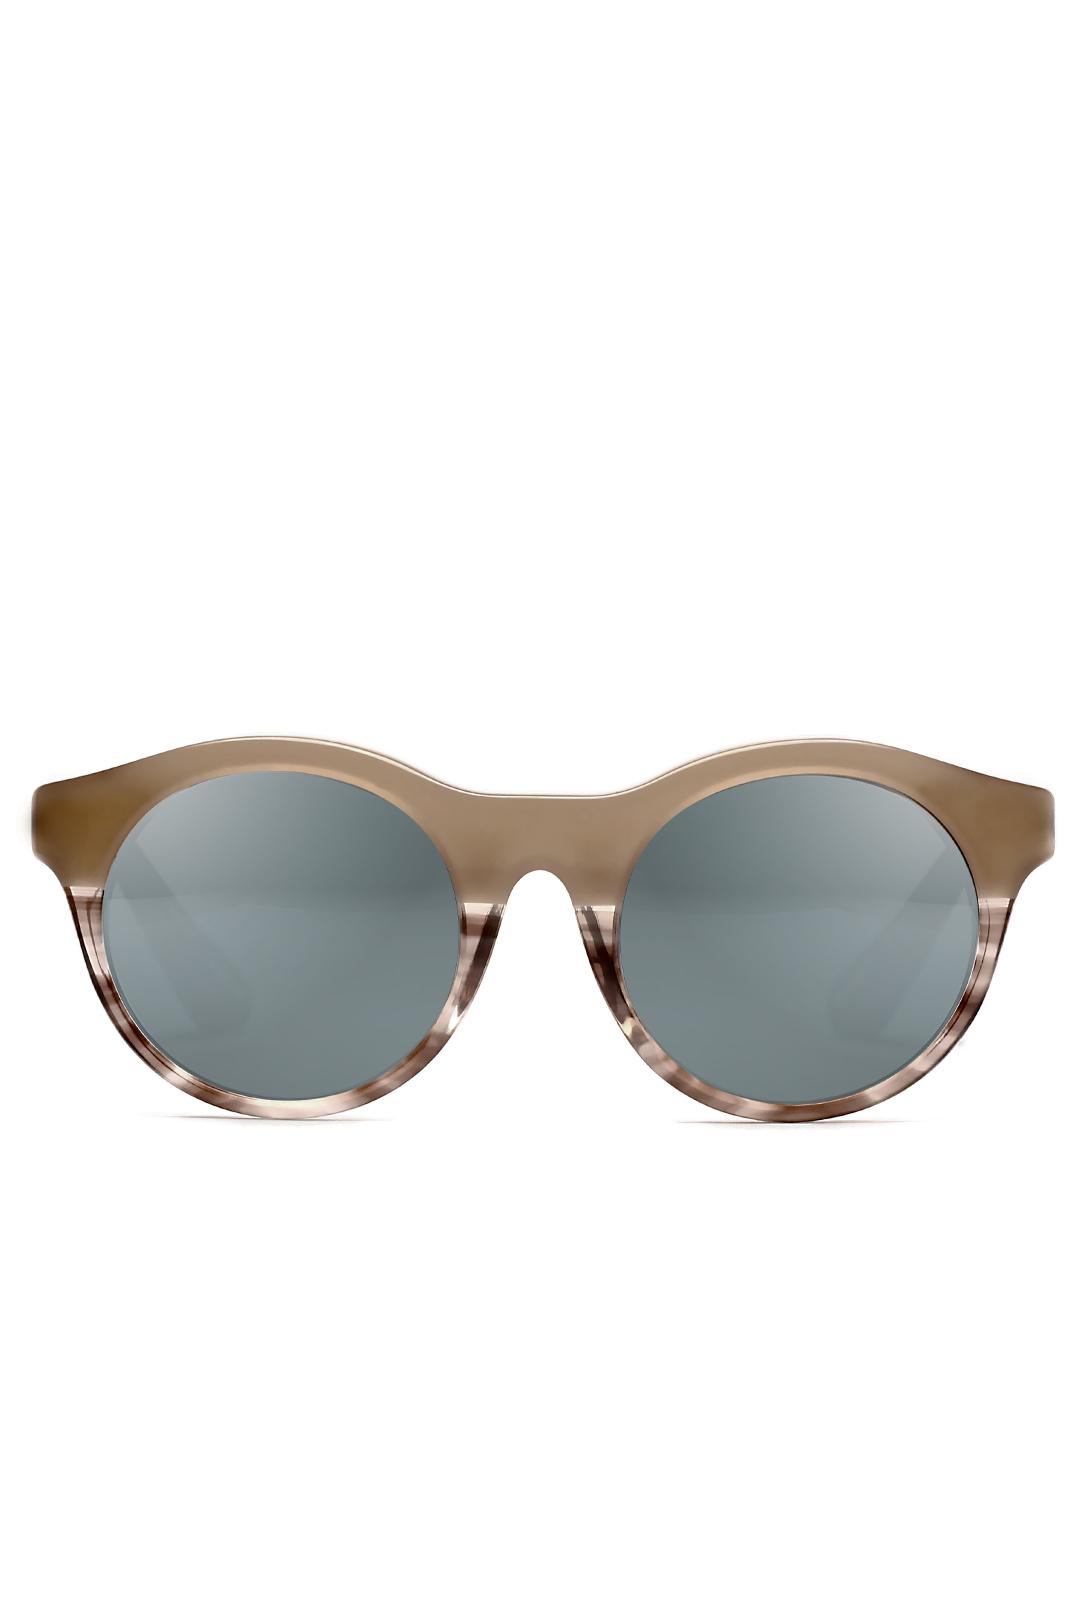 Elizabeth and James Accessories Crawford Sunglasses